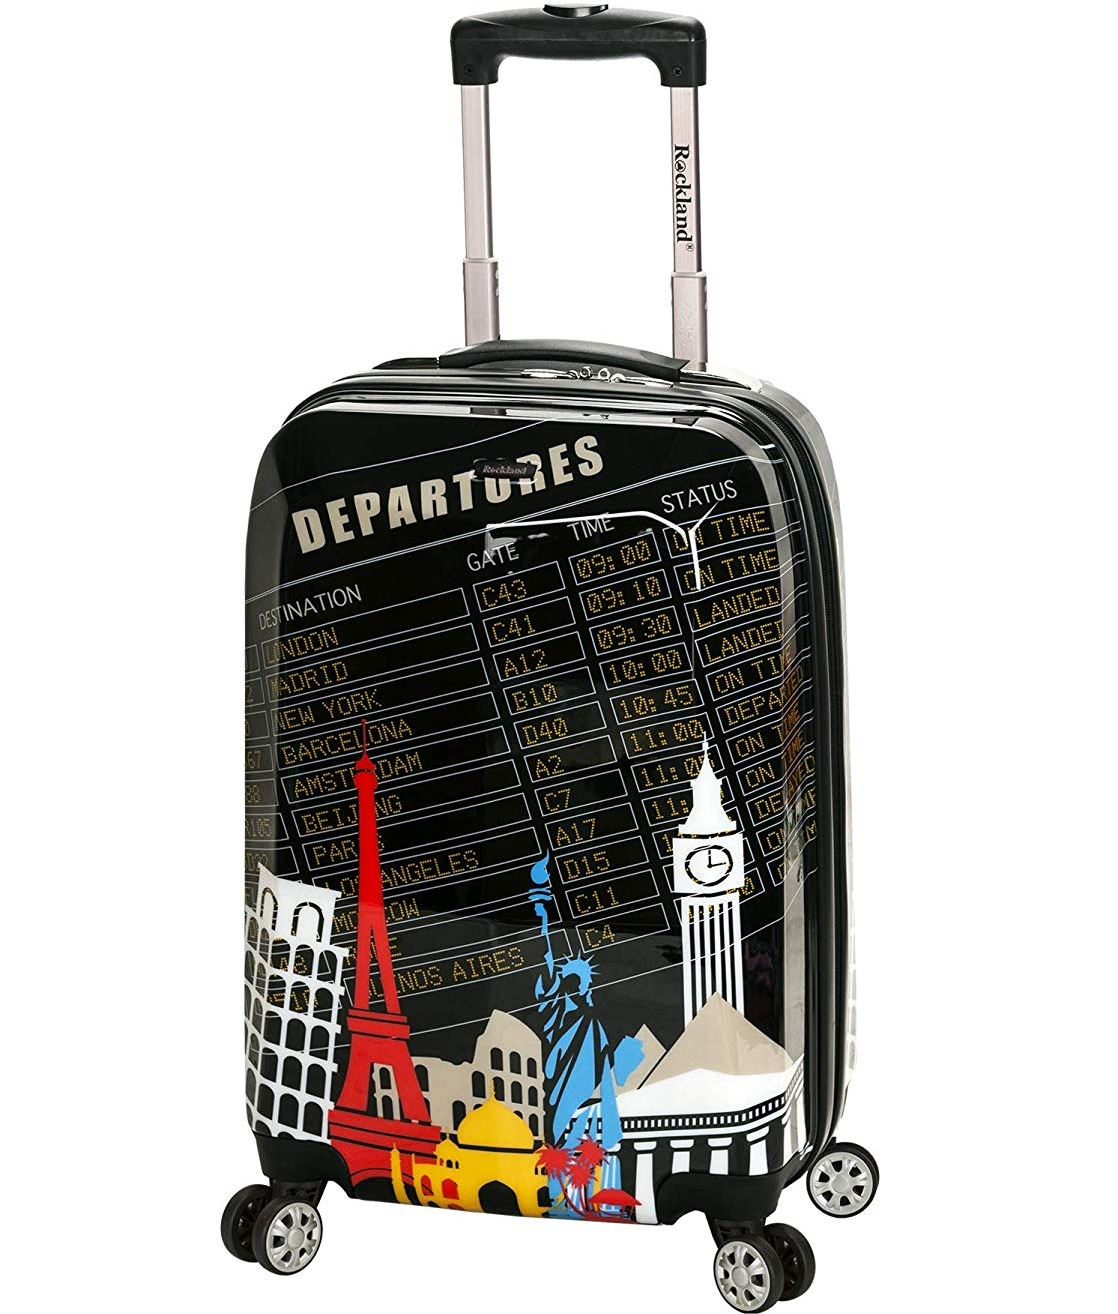 big-kids-travel-luggage.jpg